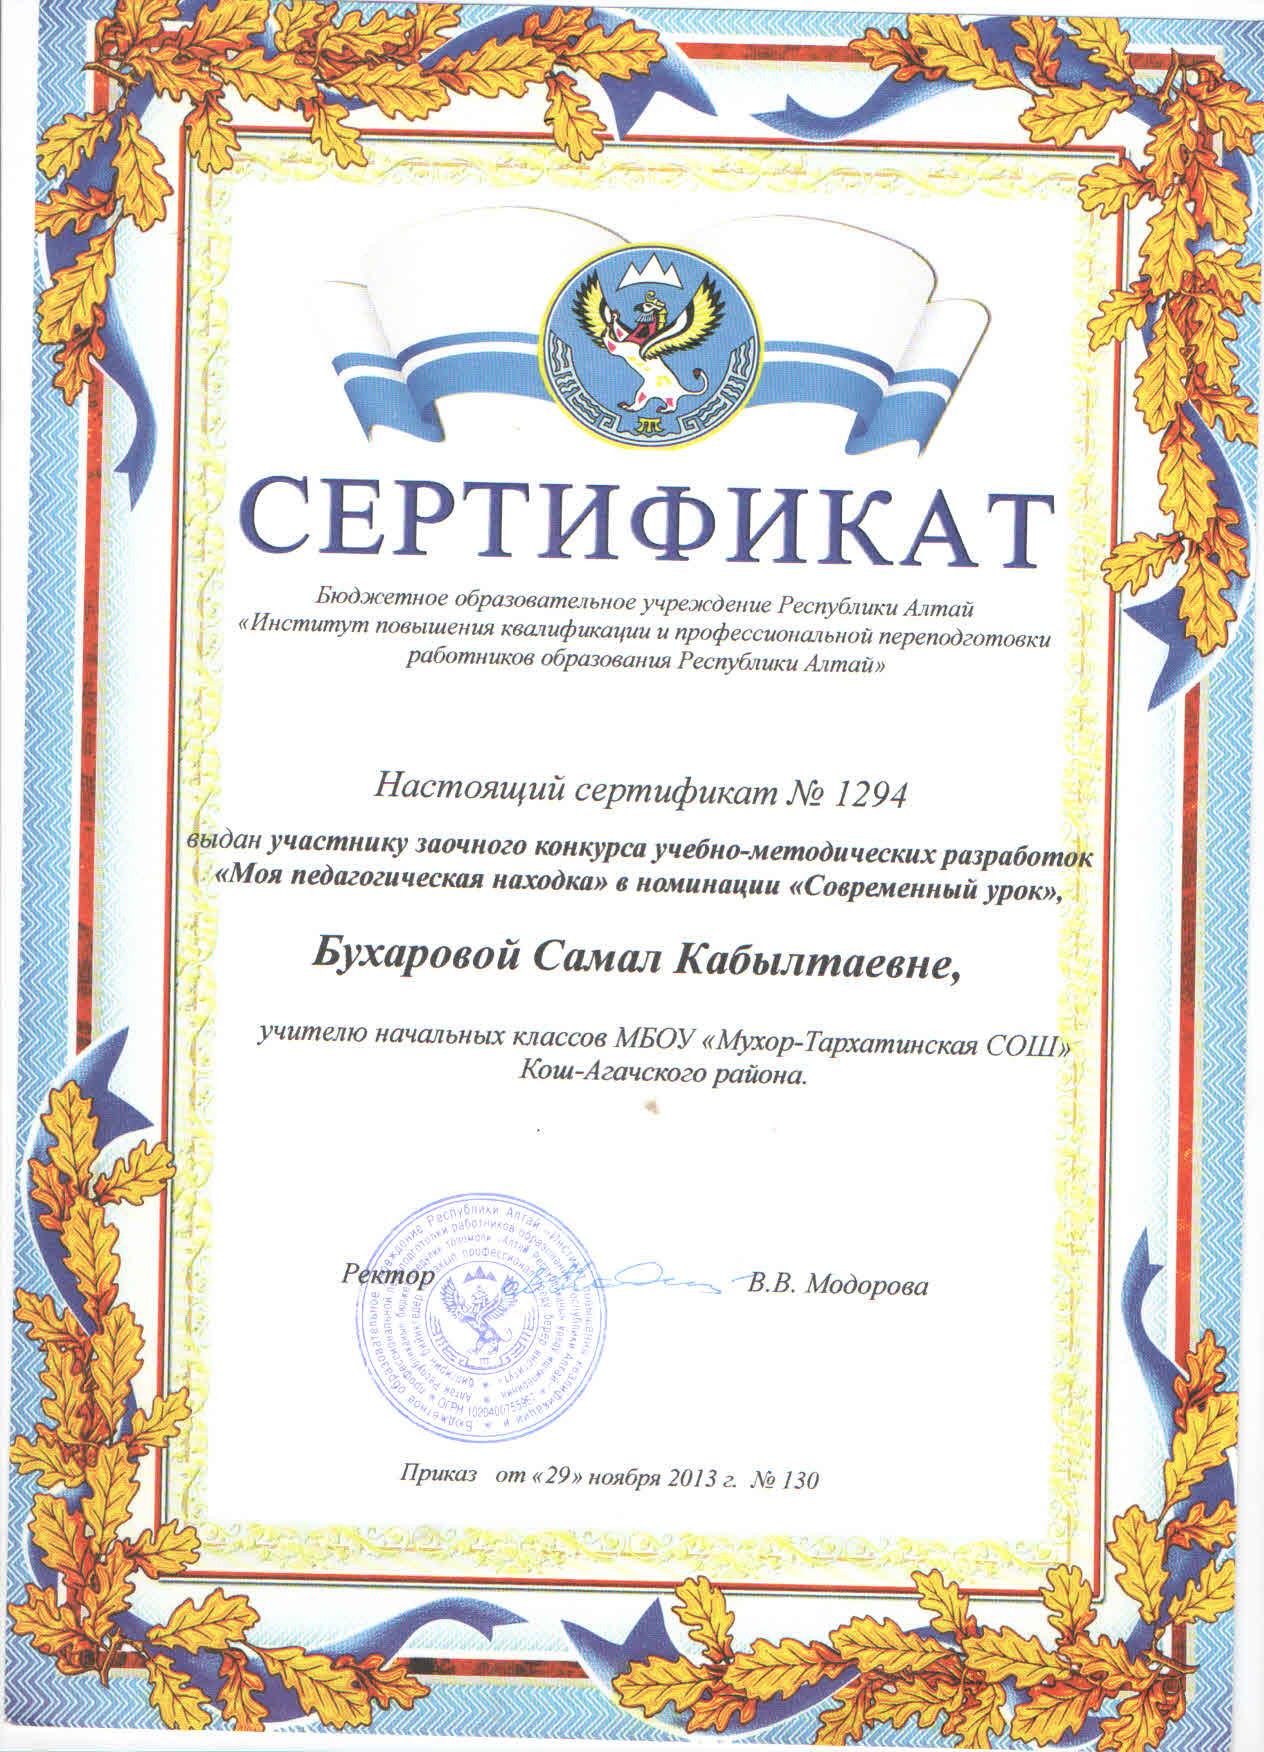 D:\грамоты\сертификат ипкрора.jpg